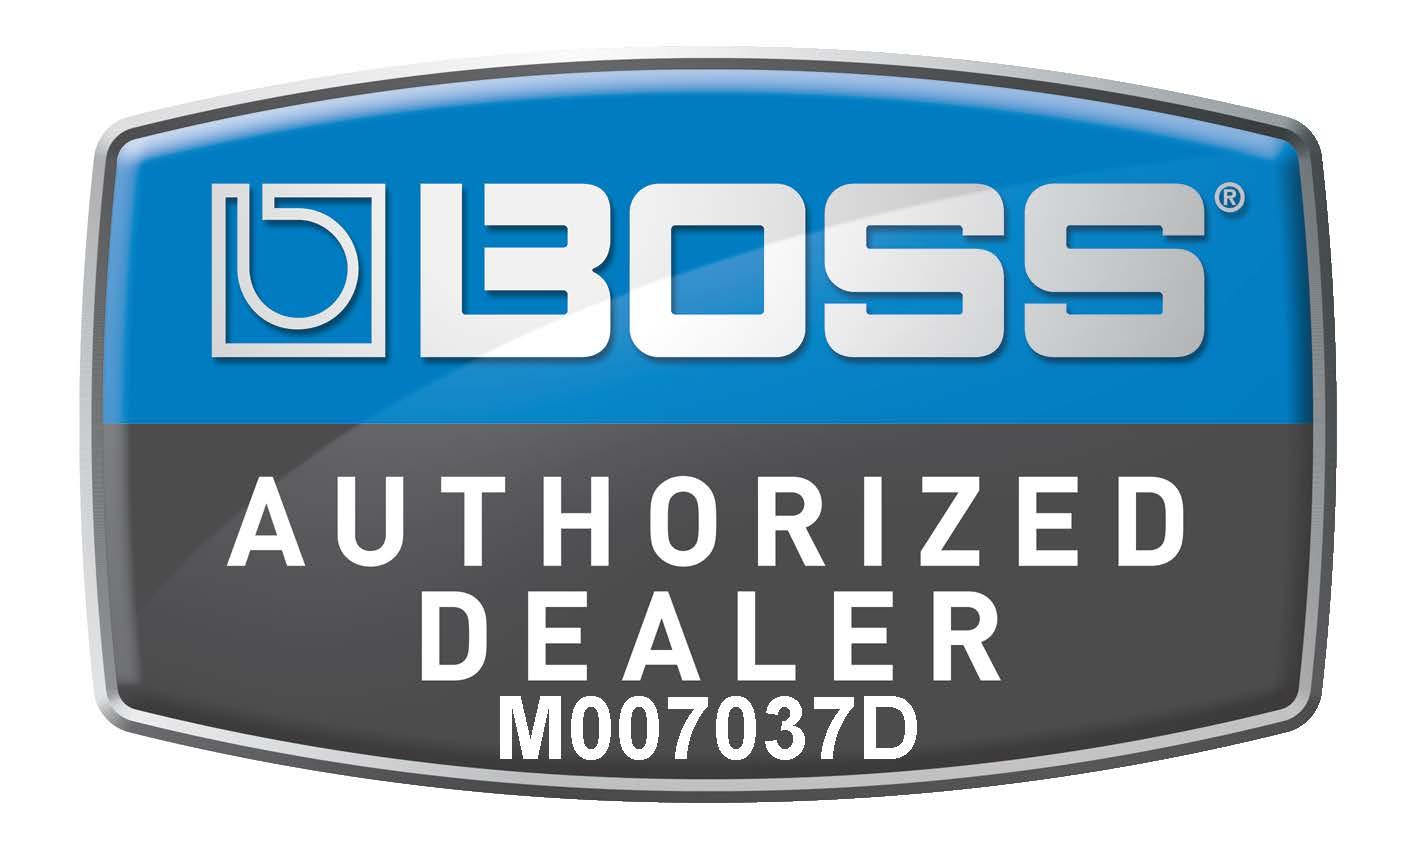 730700-ryan-fowler-s-guitar-experience-boss-logo-.jpg